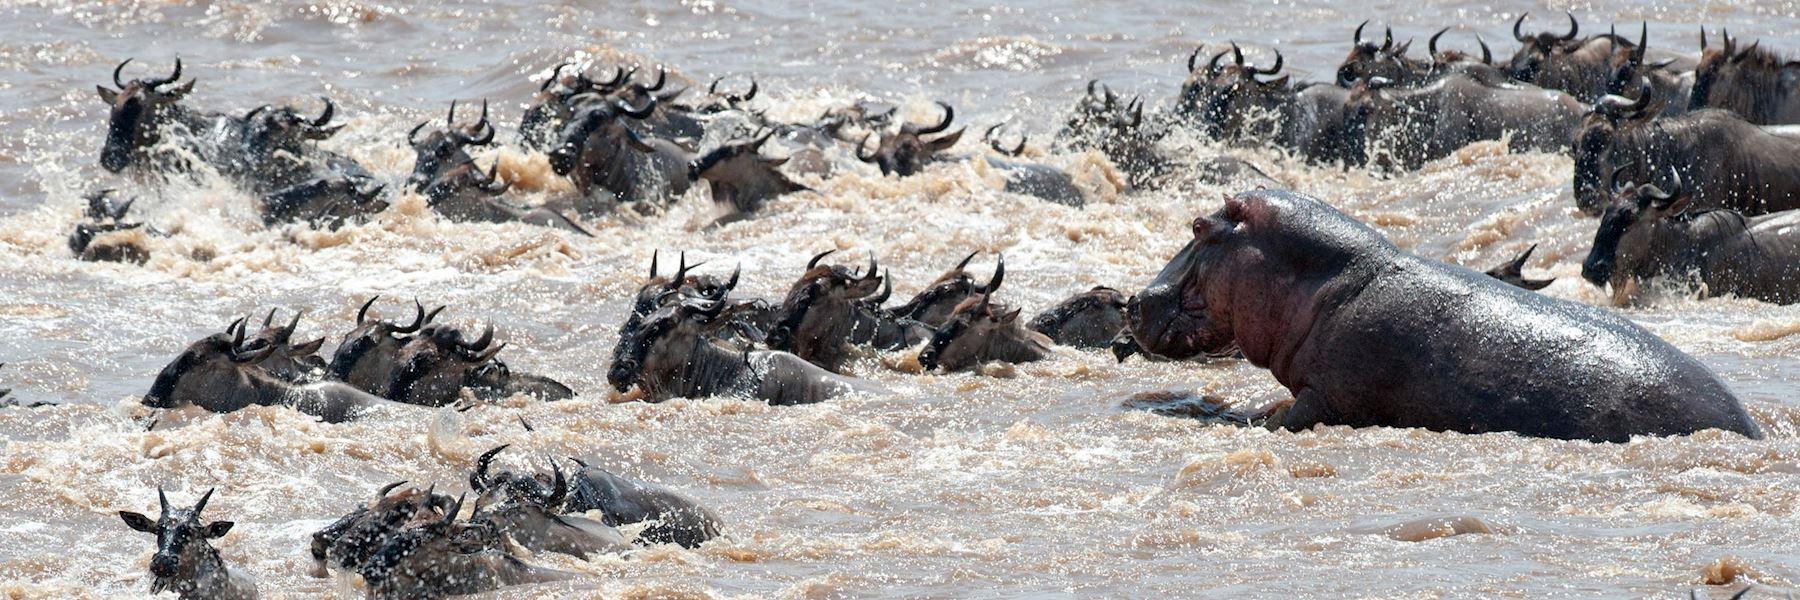 Visit Masai Mara National Reserve, Kenya